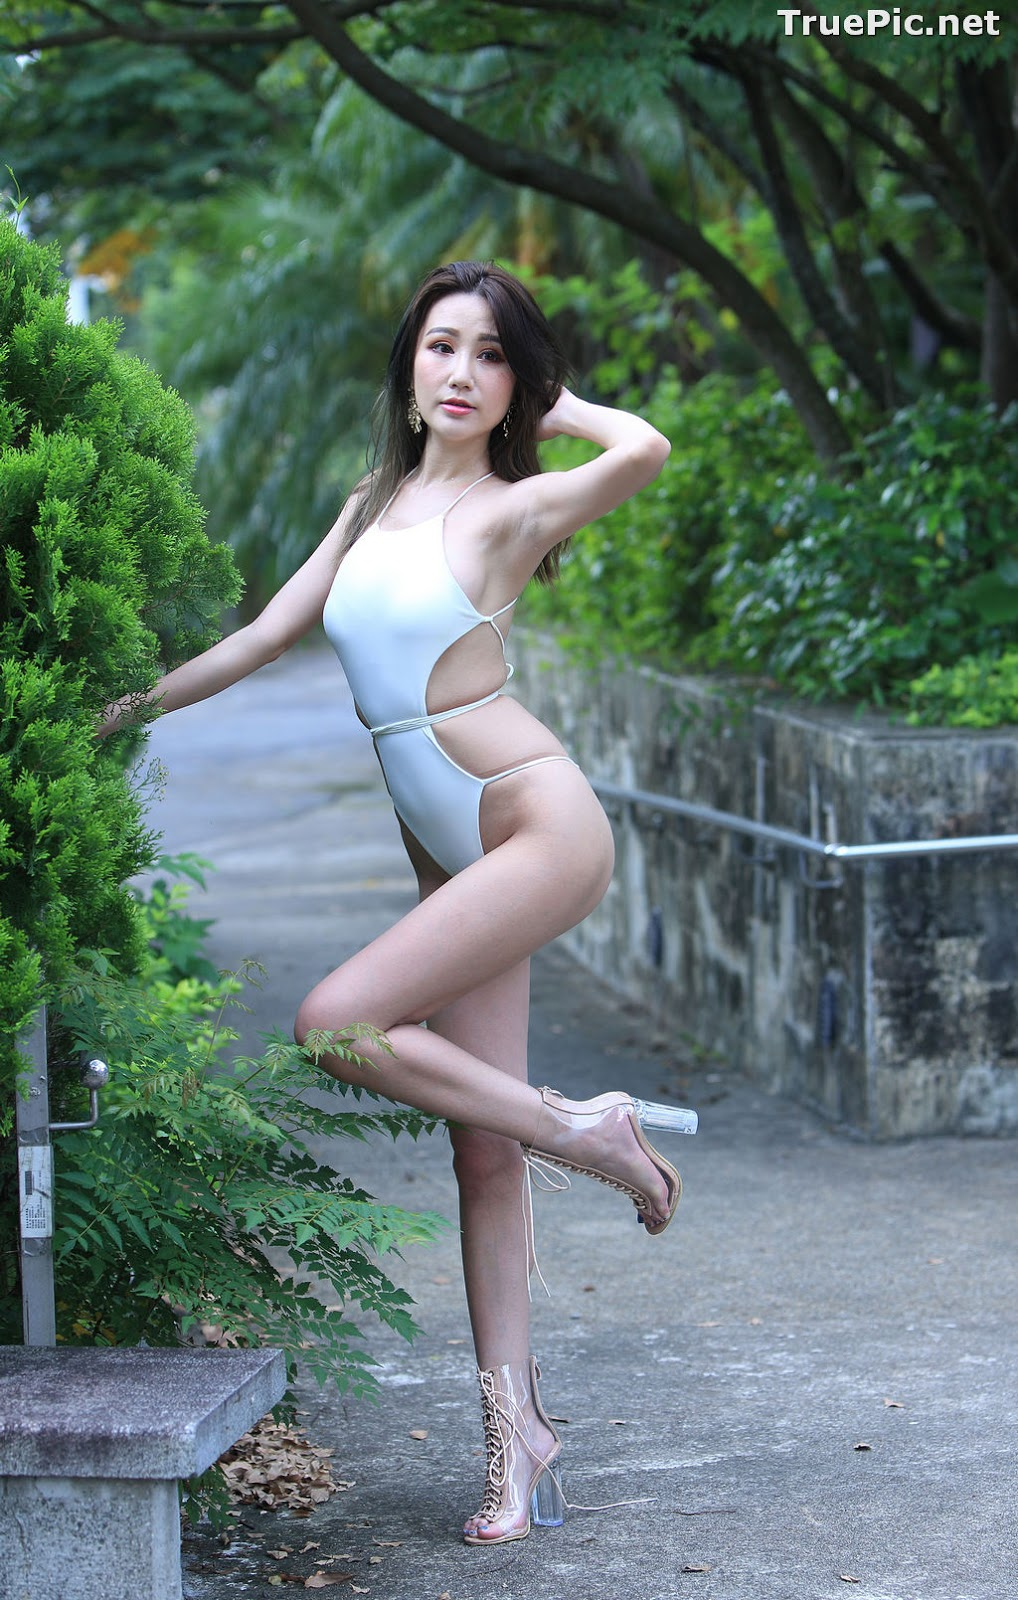 Image Taiwanese Beautiful Model - Suki - White Sexy Bikini Girl - TruePic.net - Picture-10